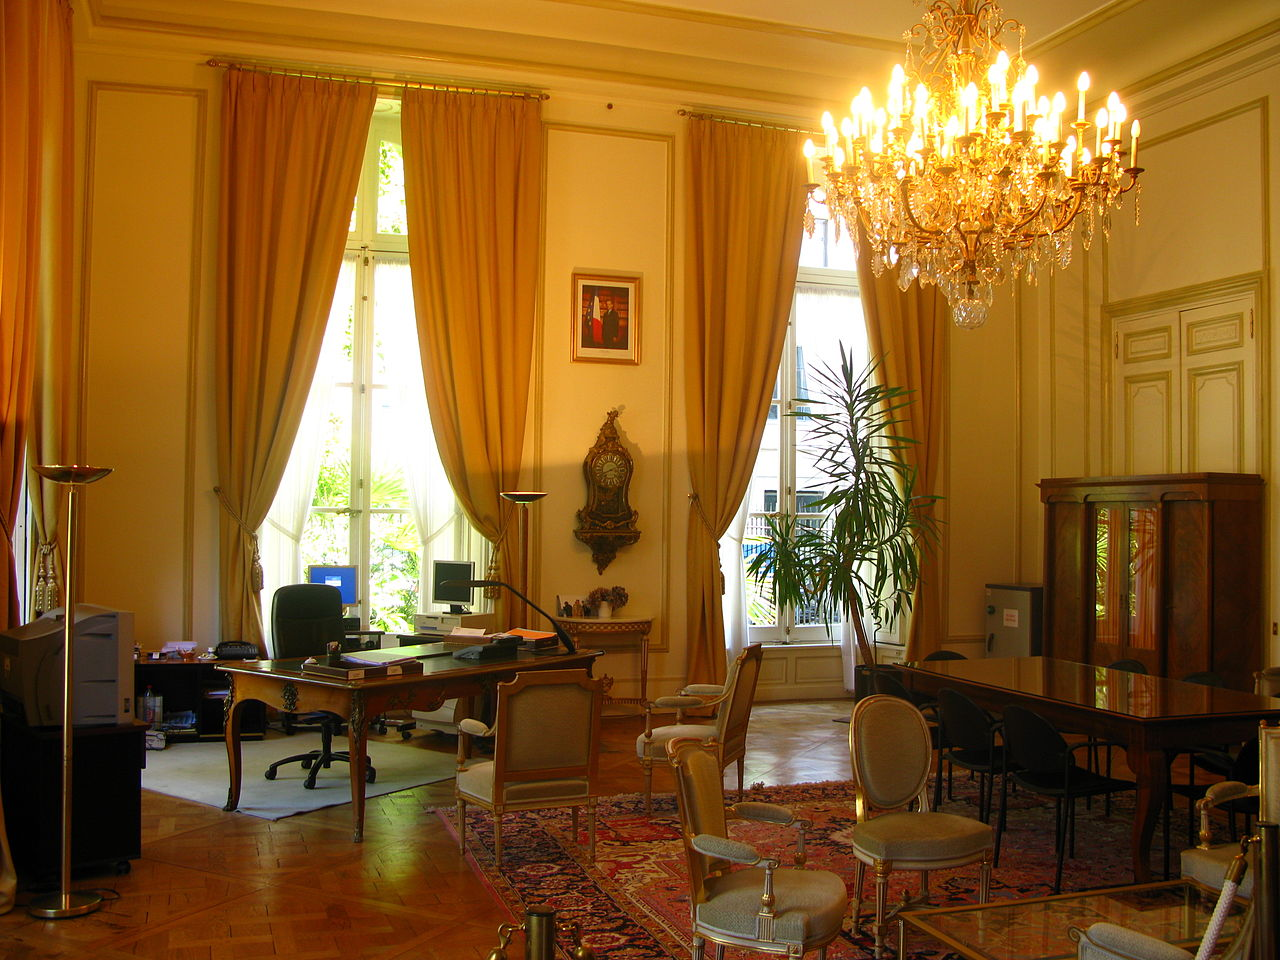 Hotel Matignon Grand Place Brussels